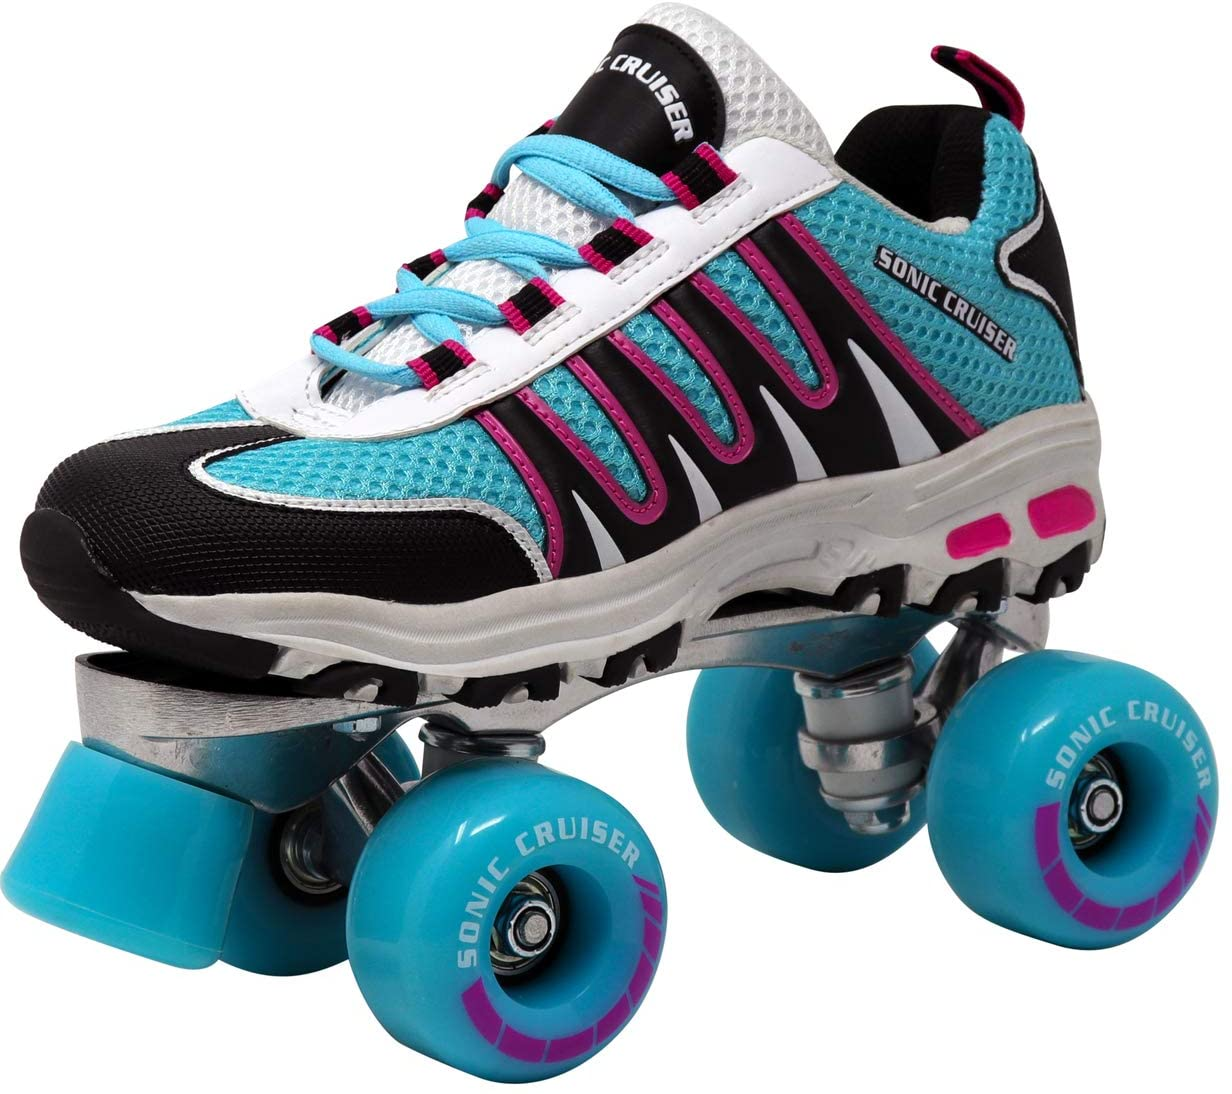 Sonic Cruiser Fun Skate